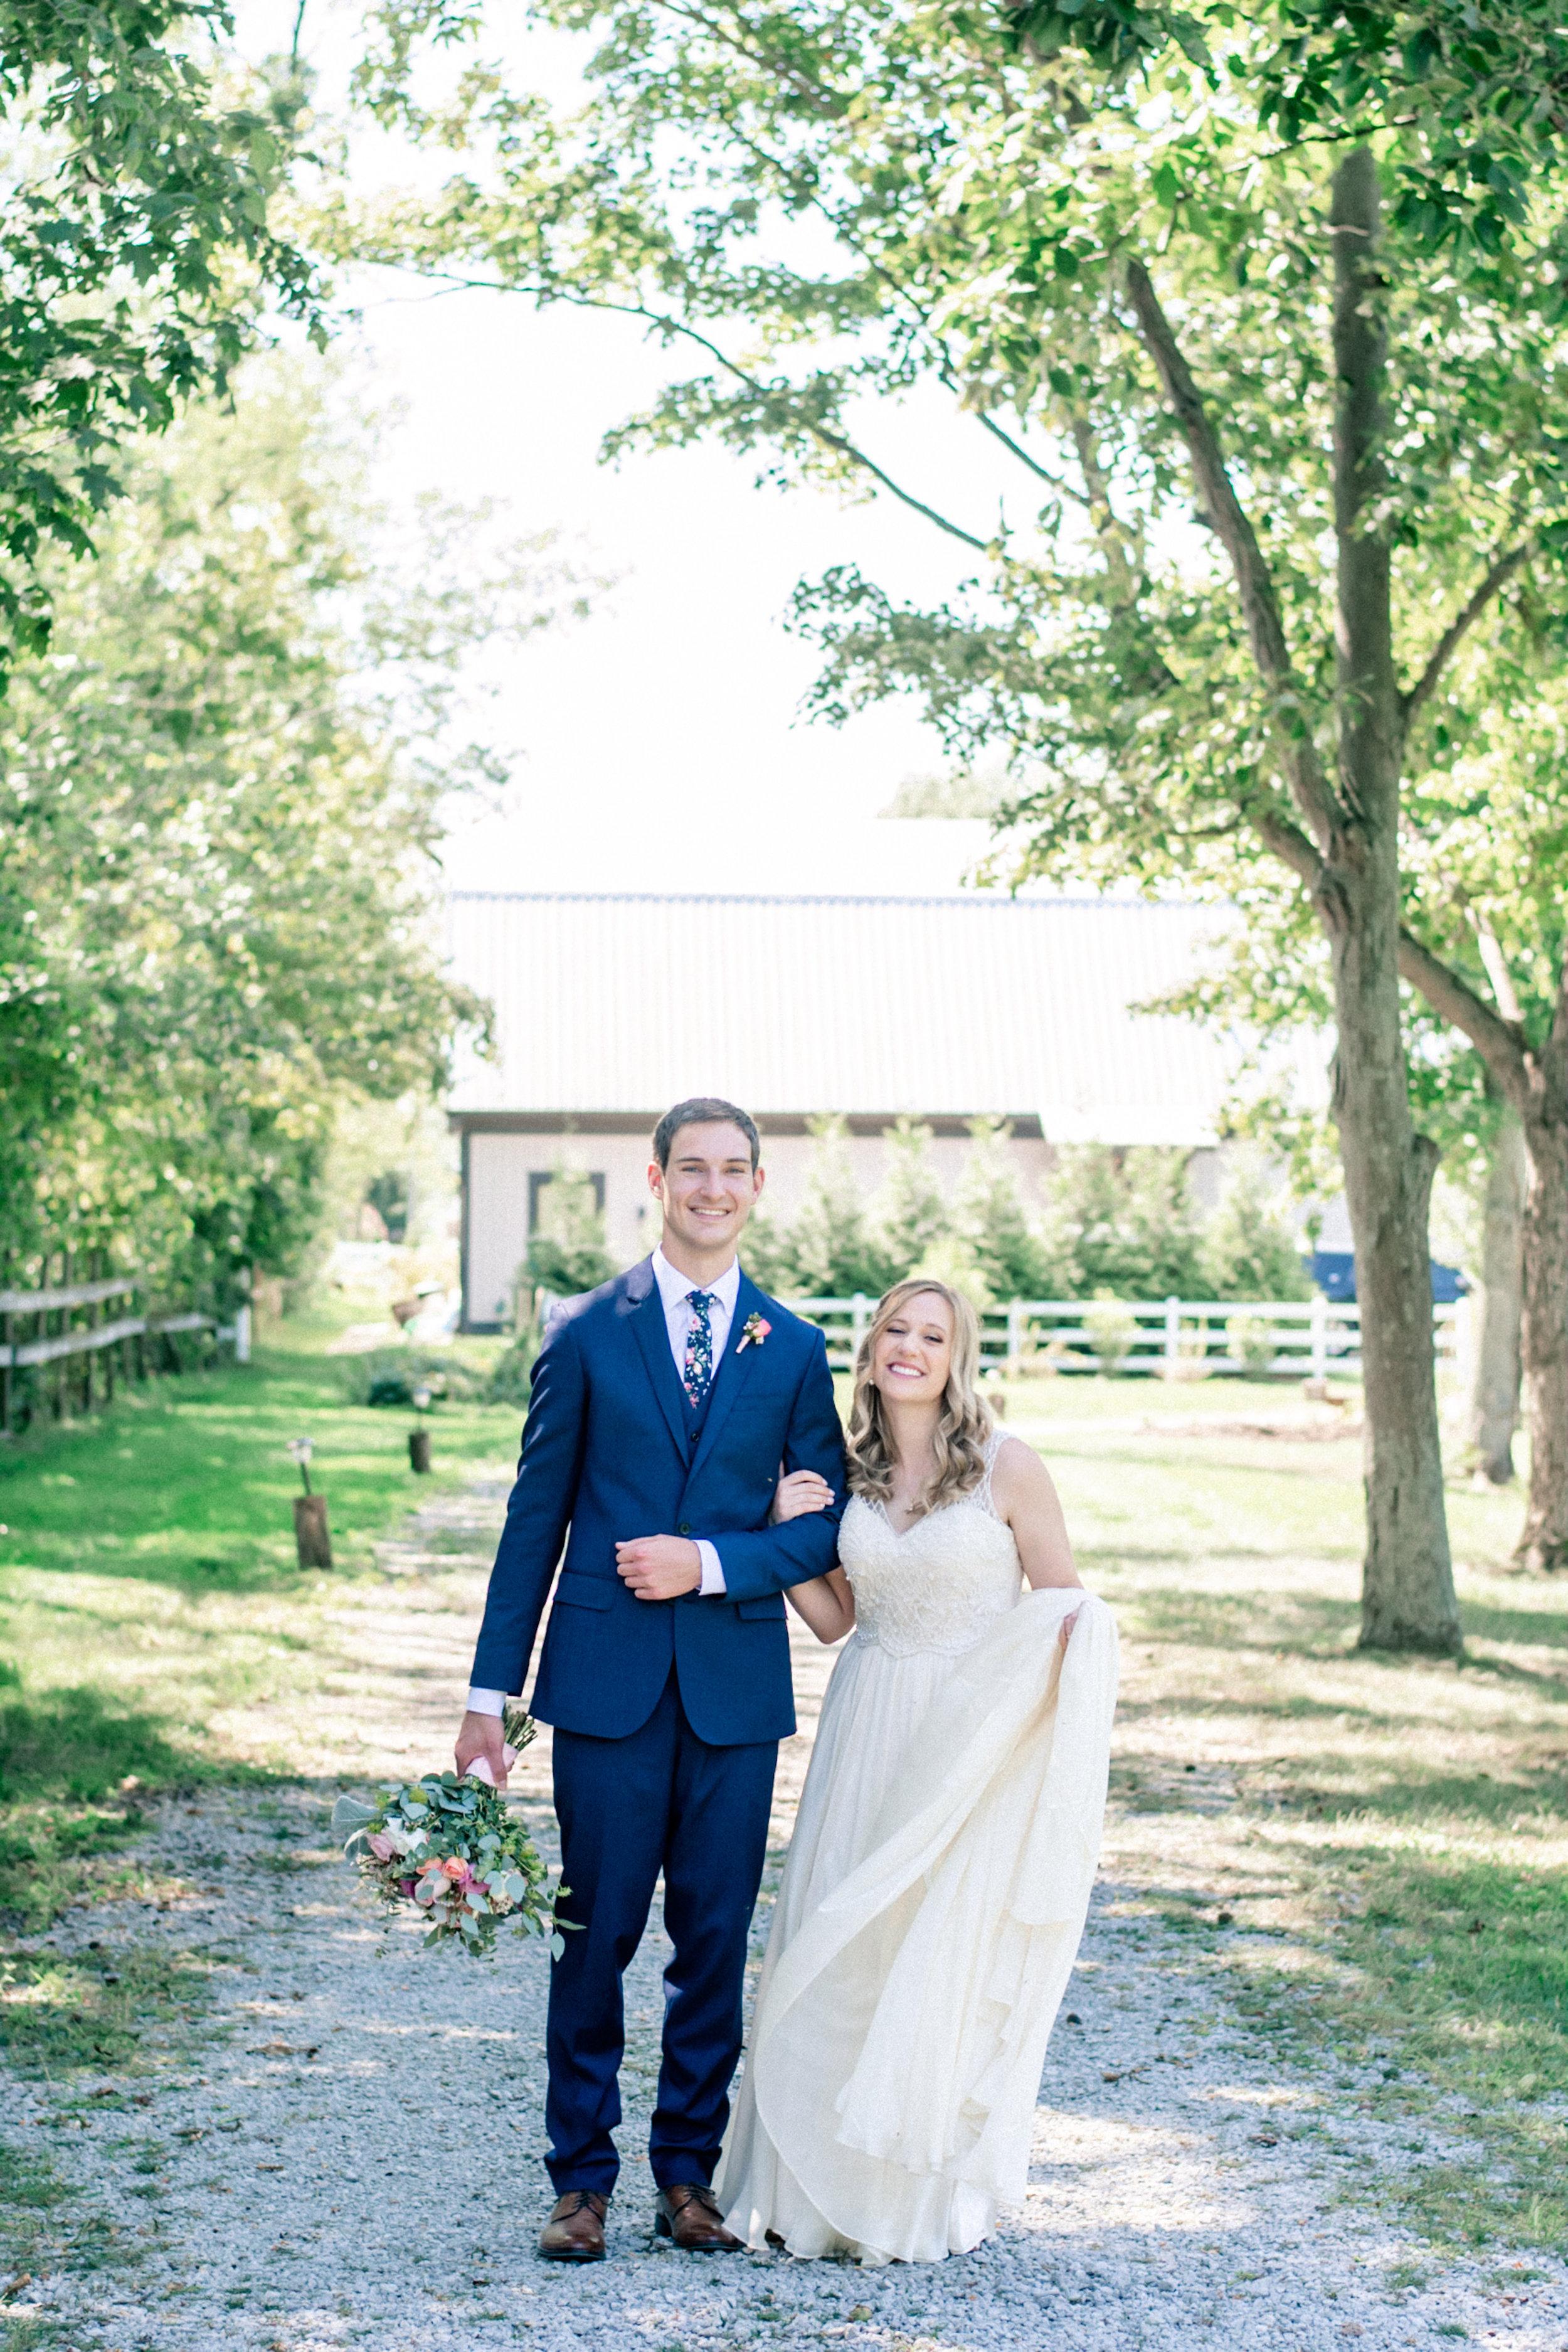 Brideandgroom-Anna+Dan_(17_of_19).jpg